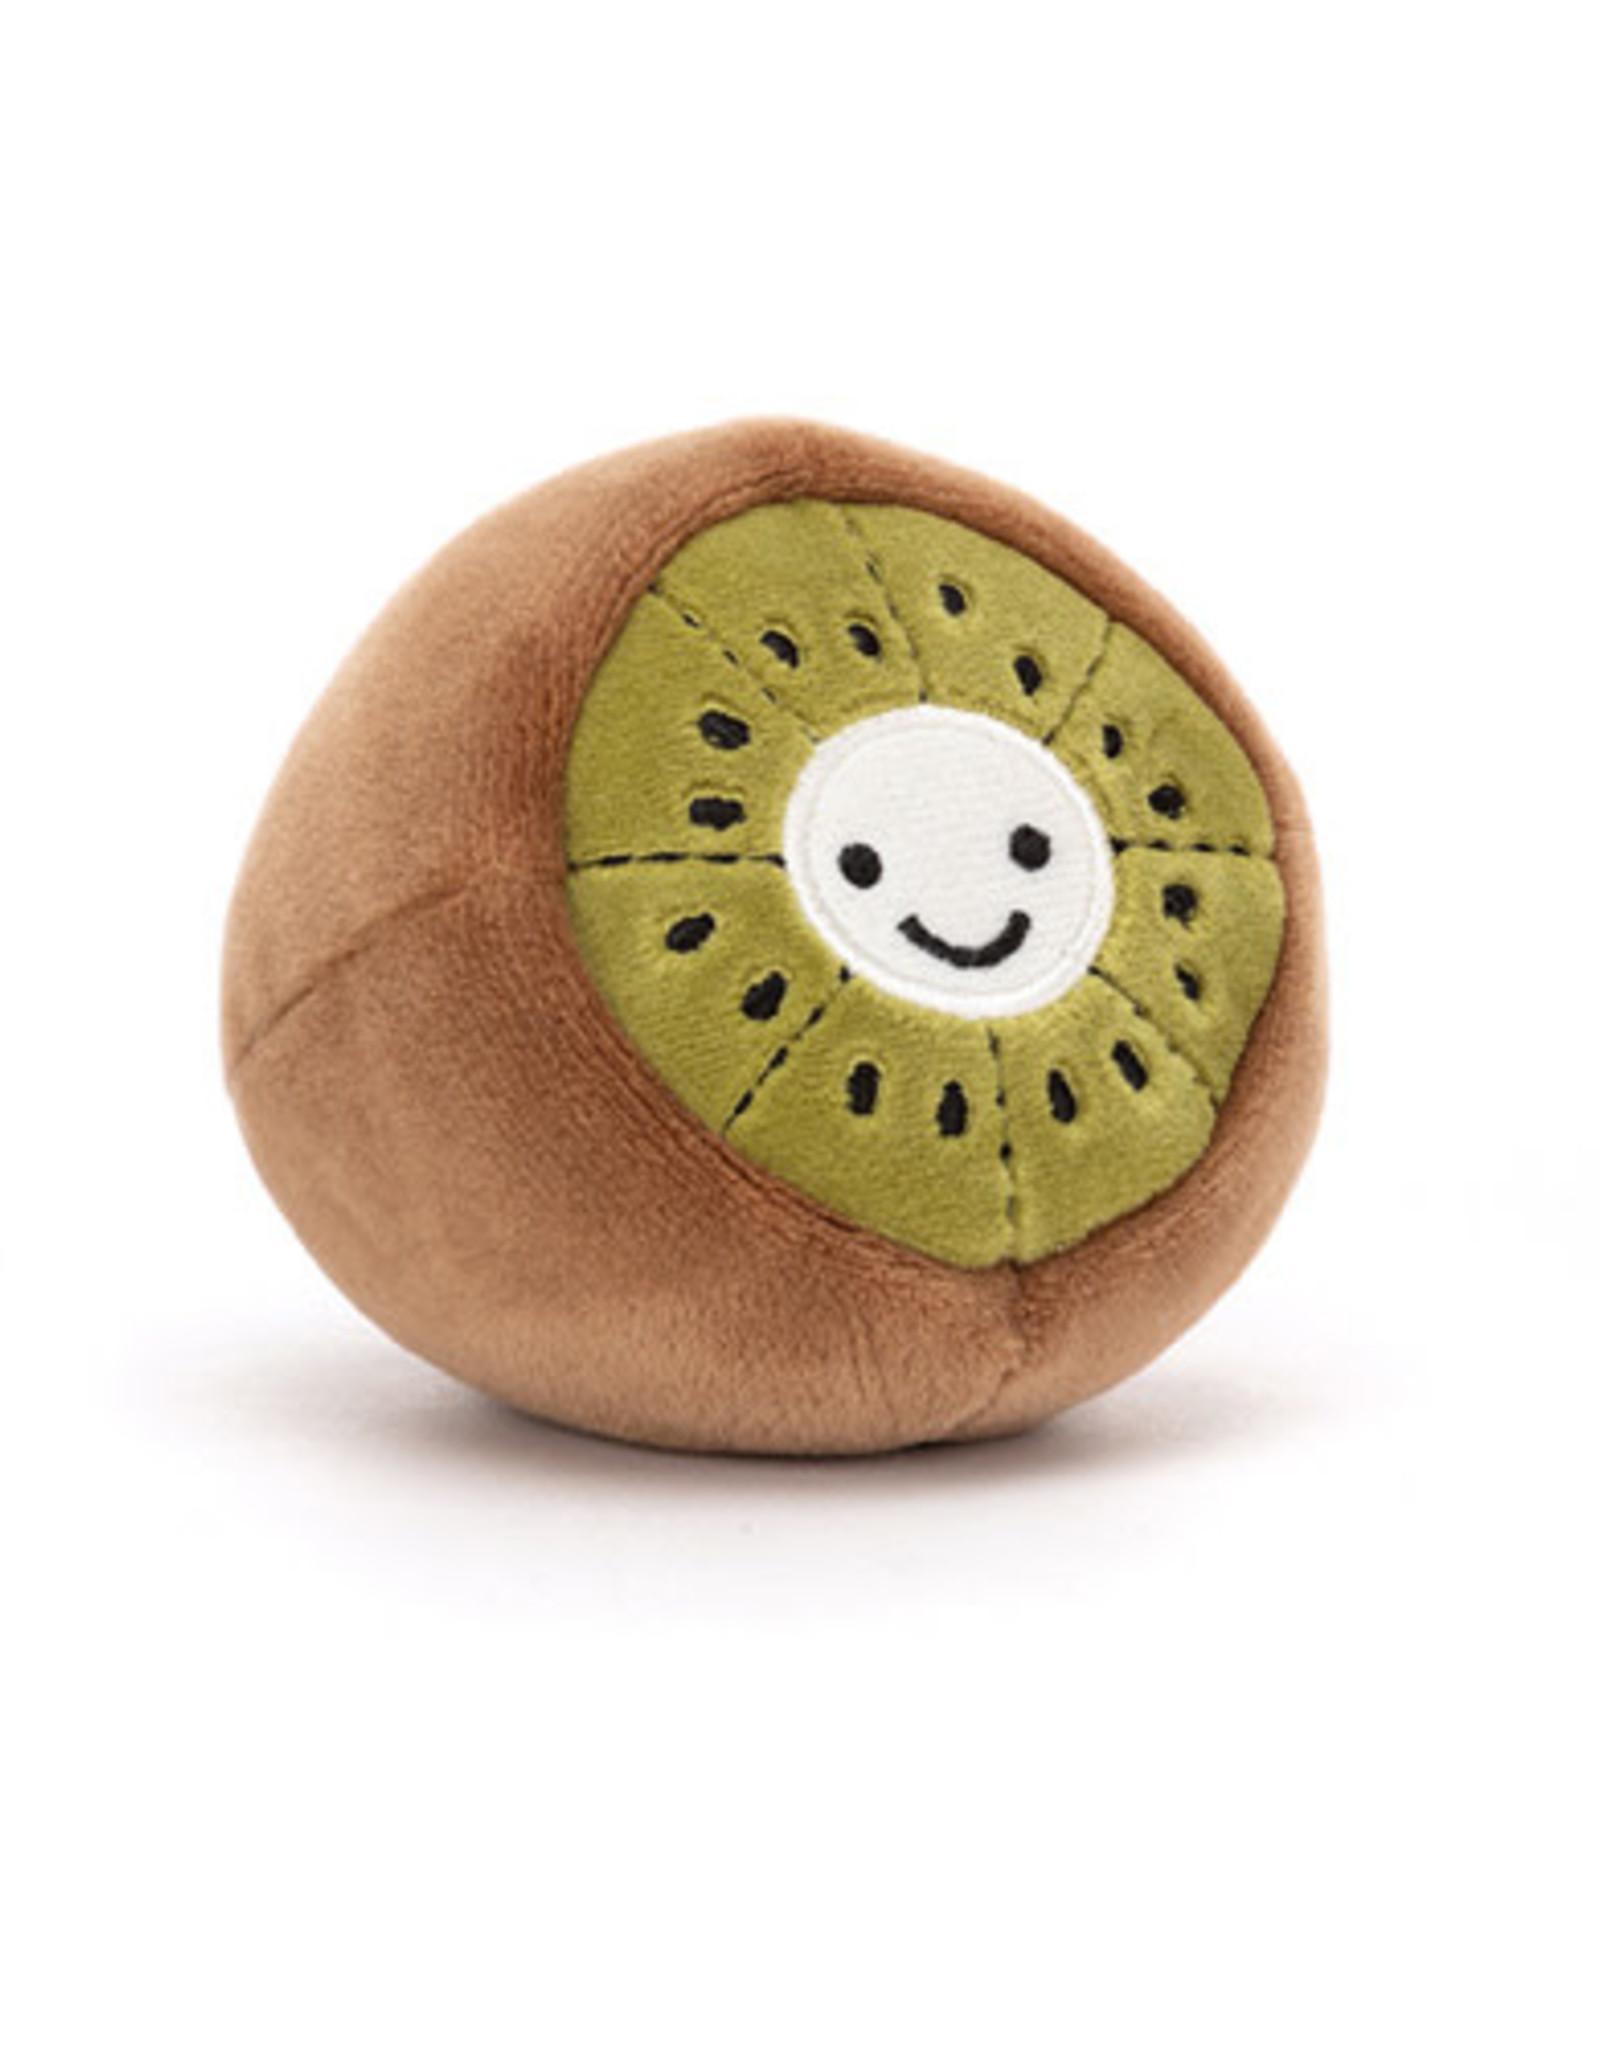 Jellycat Fabulous Fruit Kiwi